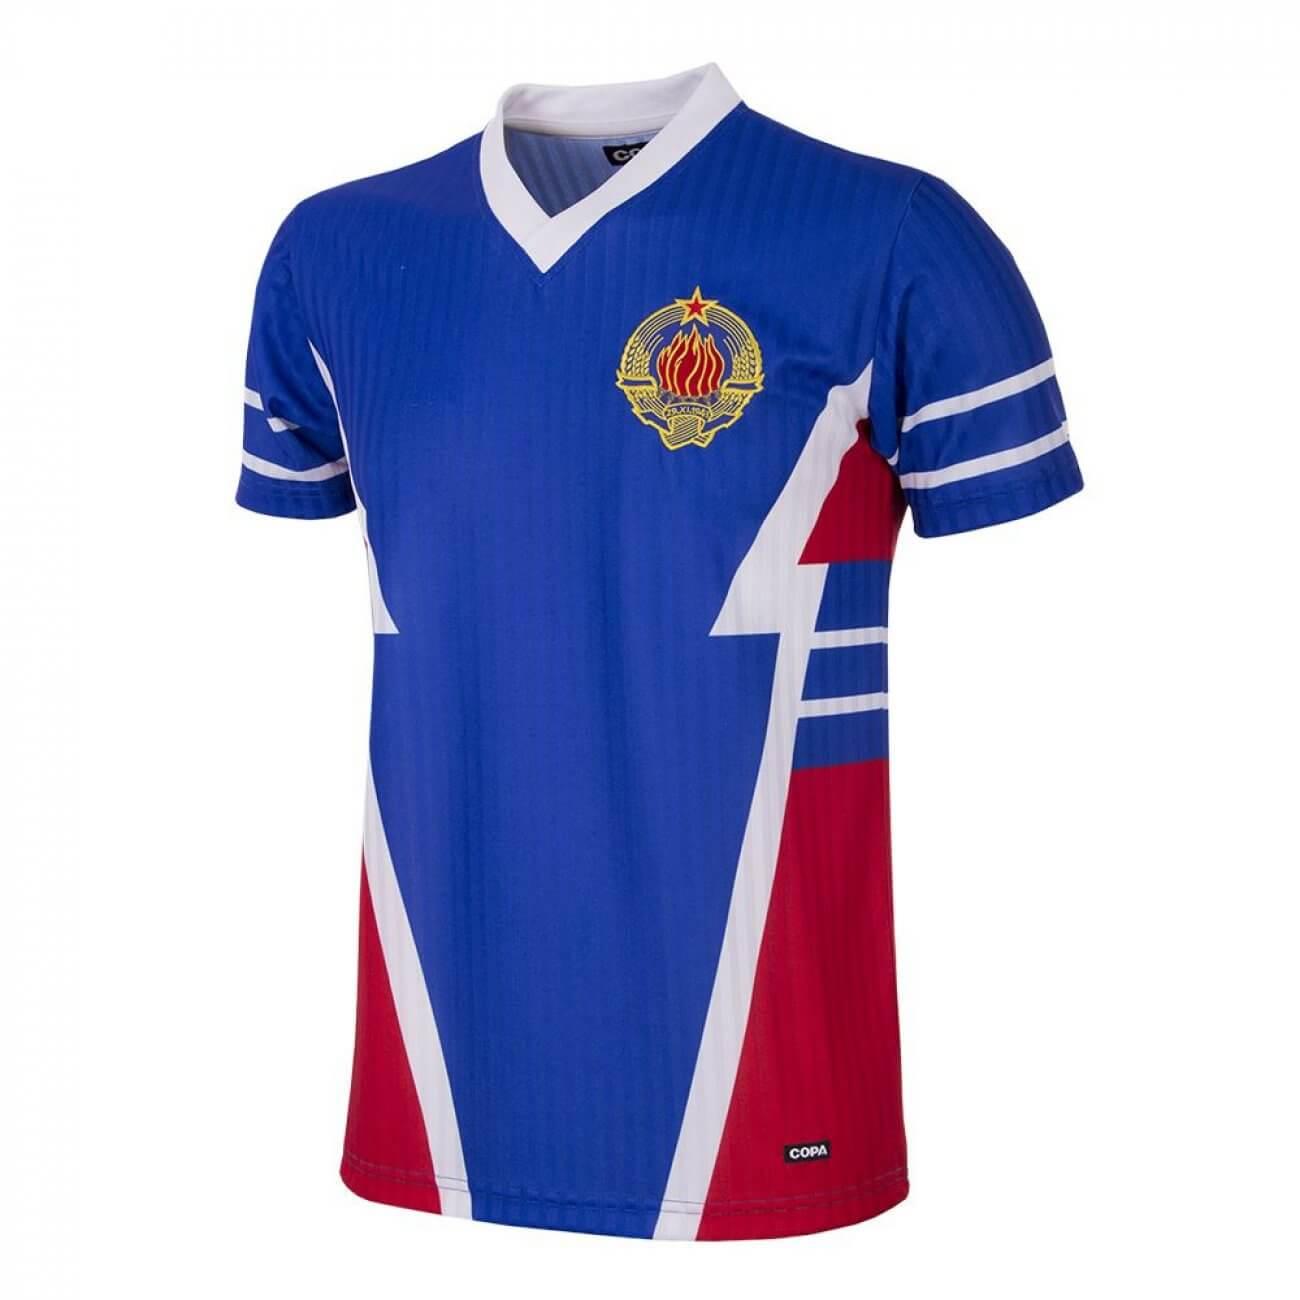 football shirt image